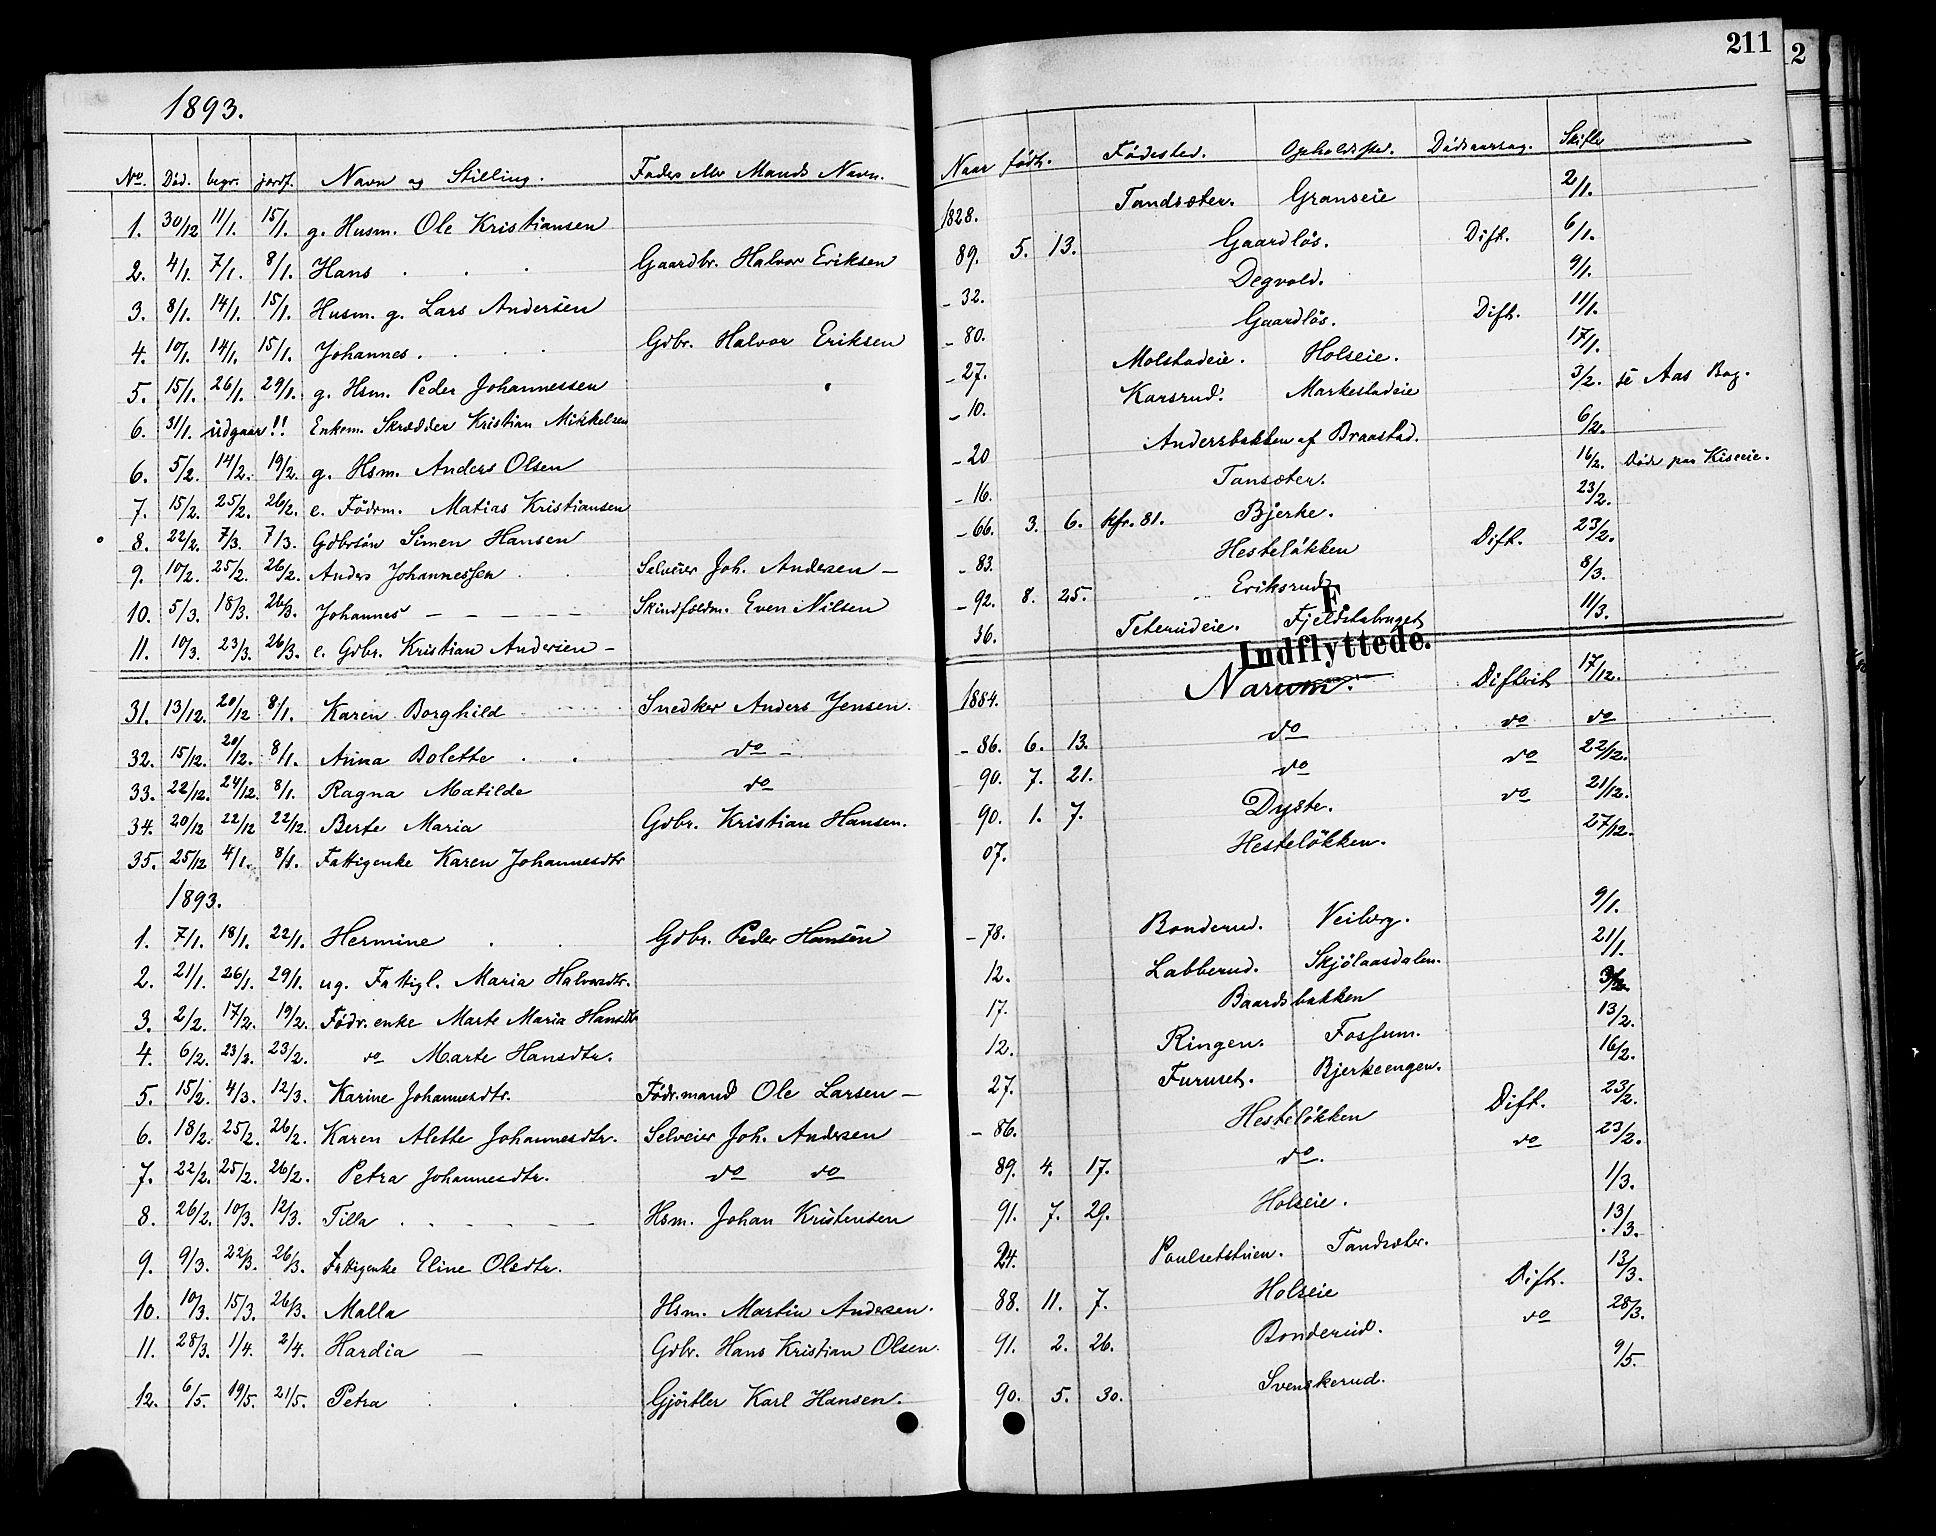 SAH, Vestre Toten prestekontor, H/Ha/Haa/L0010: Ministerialbok nr. 10, 1878-1894, s. 211